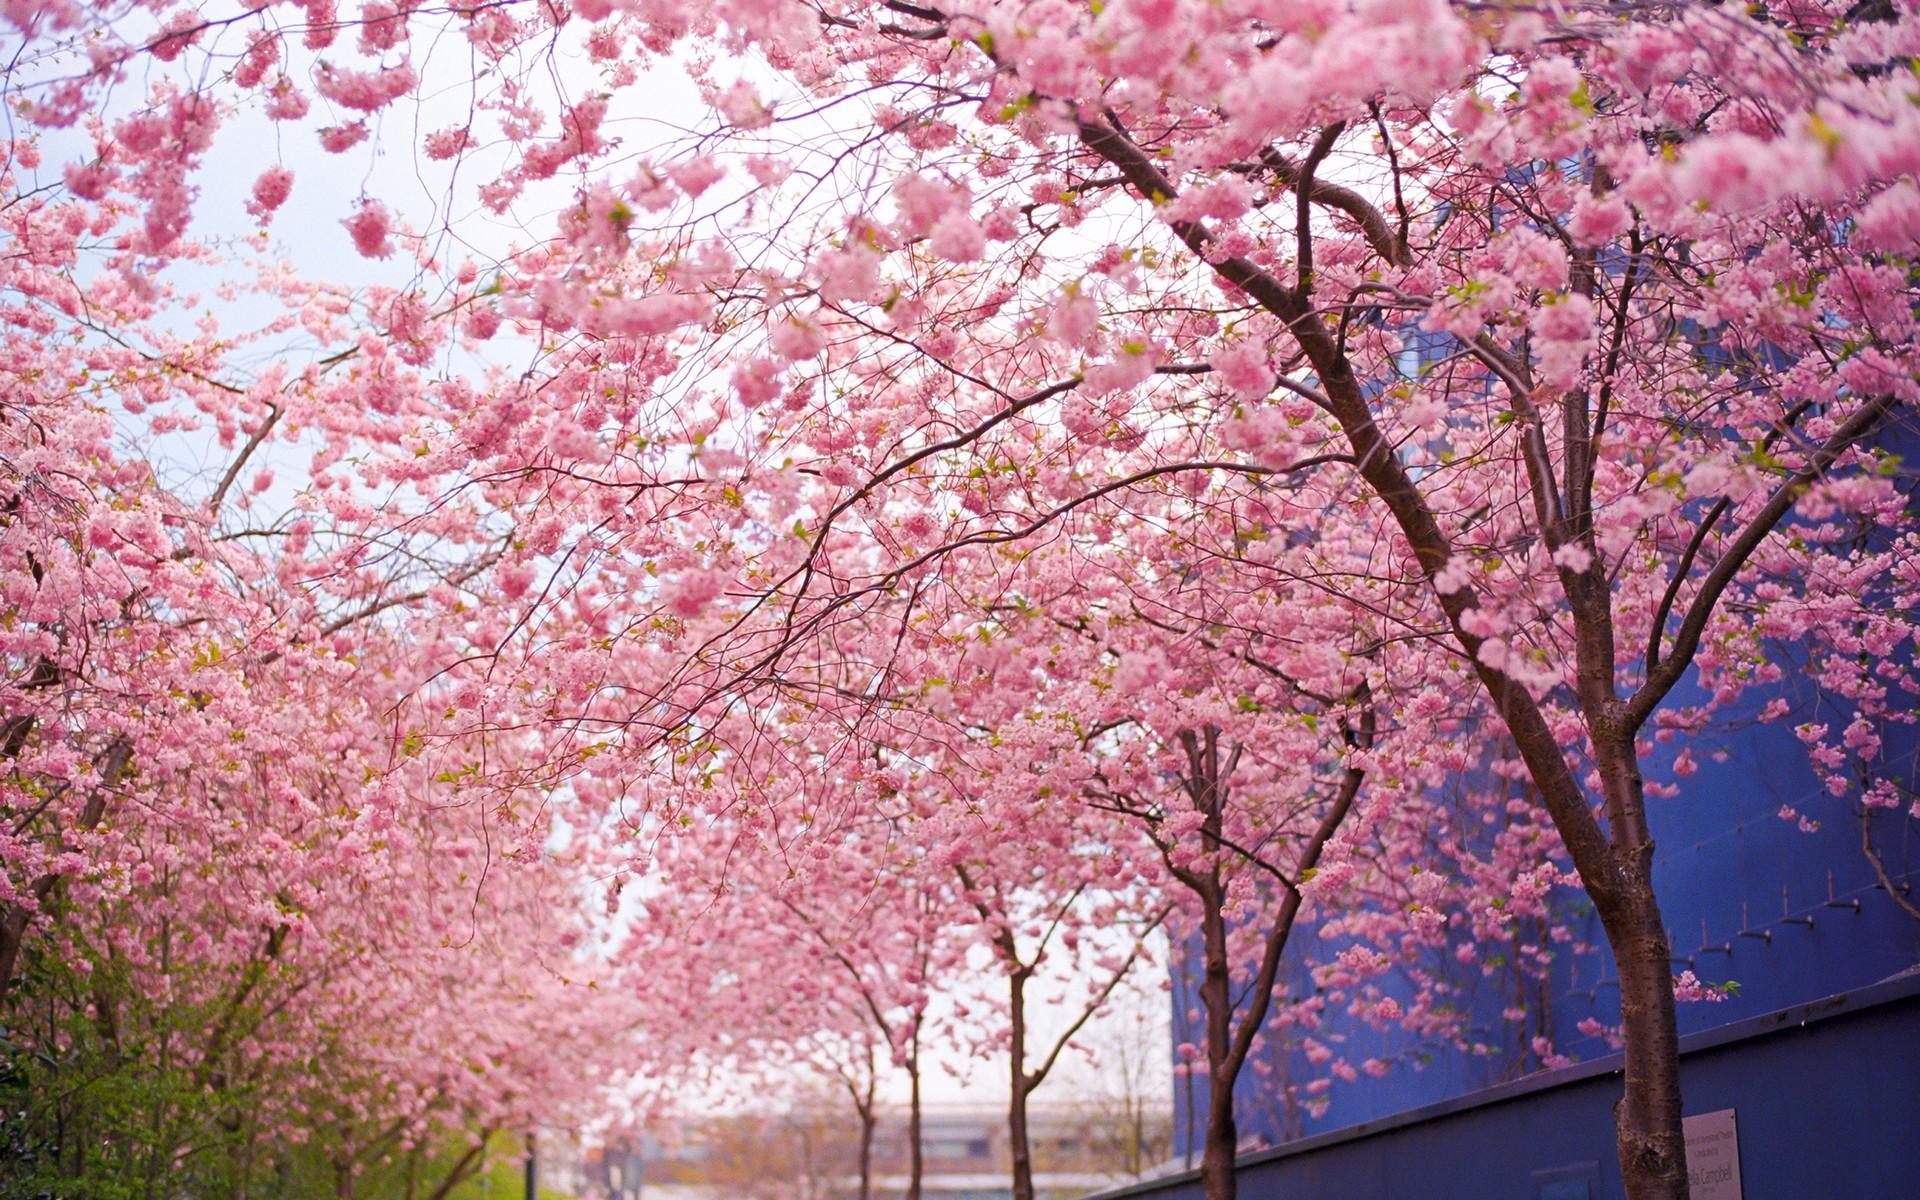 Cherry Blossom Tree Wallpaper 18 Pretty Desktop Backgrounds Hd 1920x1200 Download Hd Wallpaper Wallpapertip